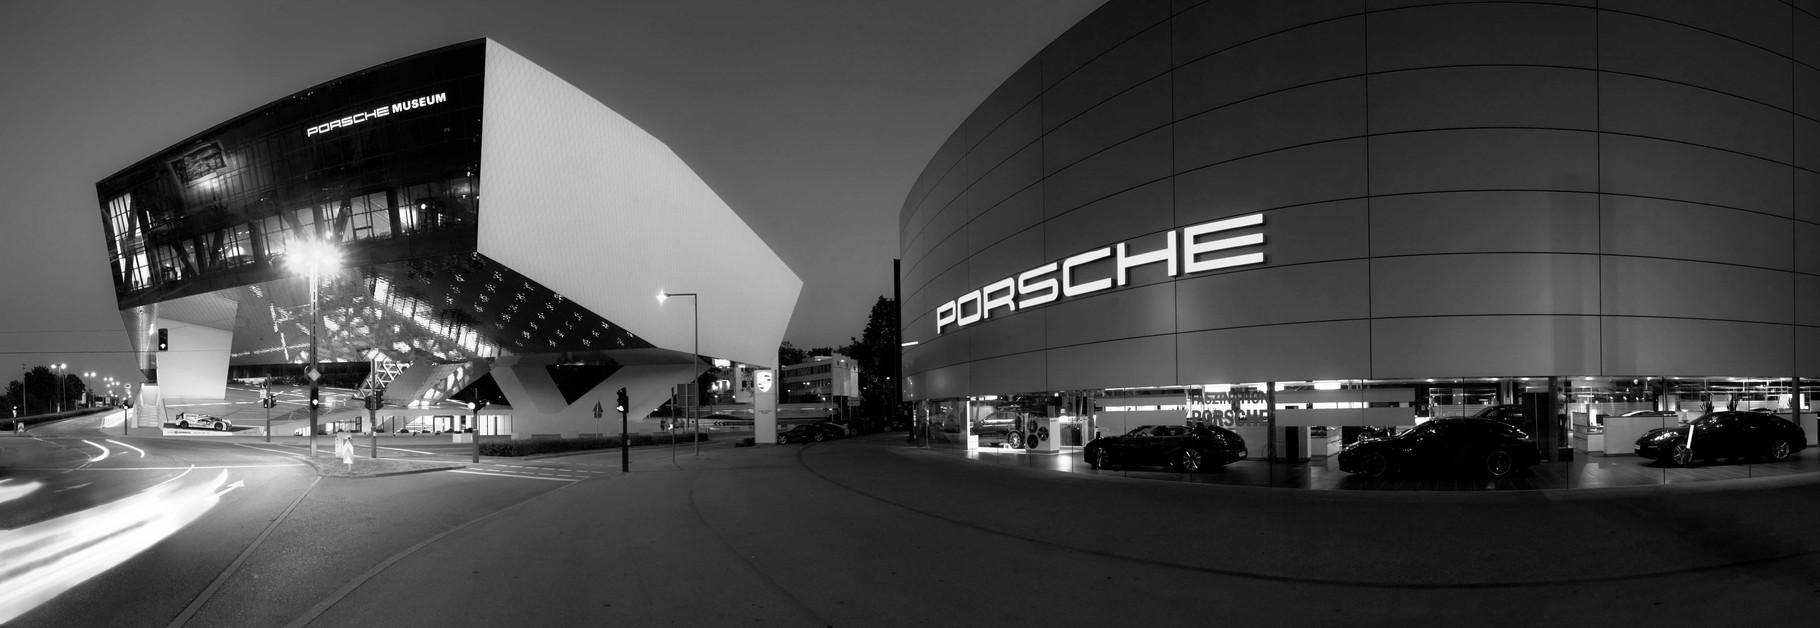 Porsche Museum Stuttgart - Panoramafotografie